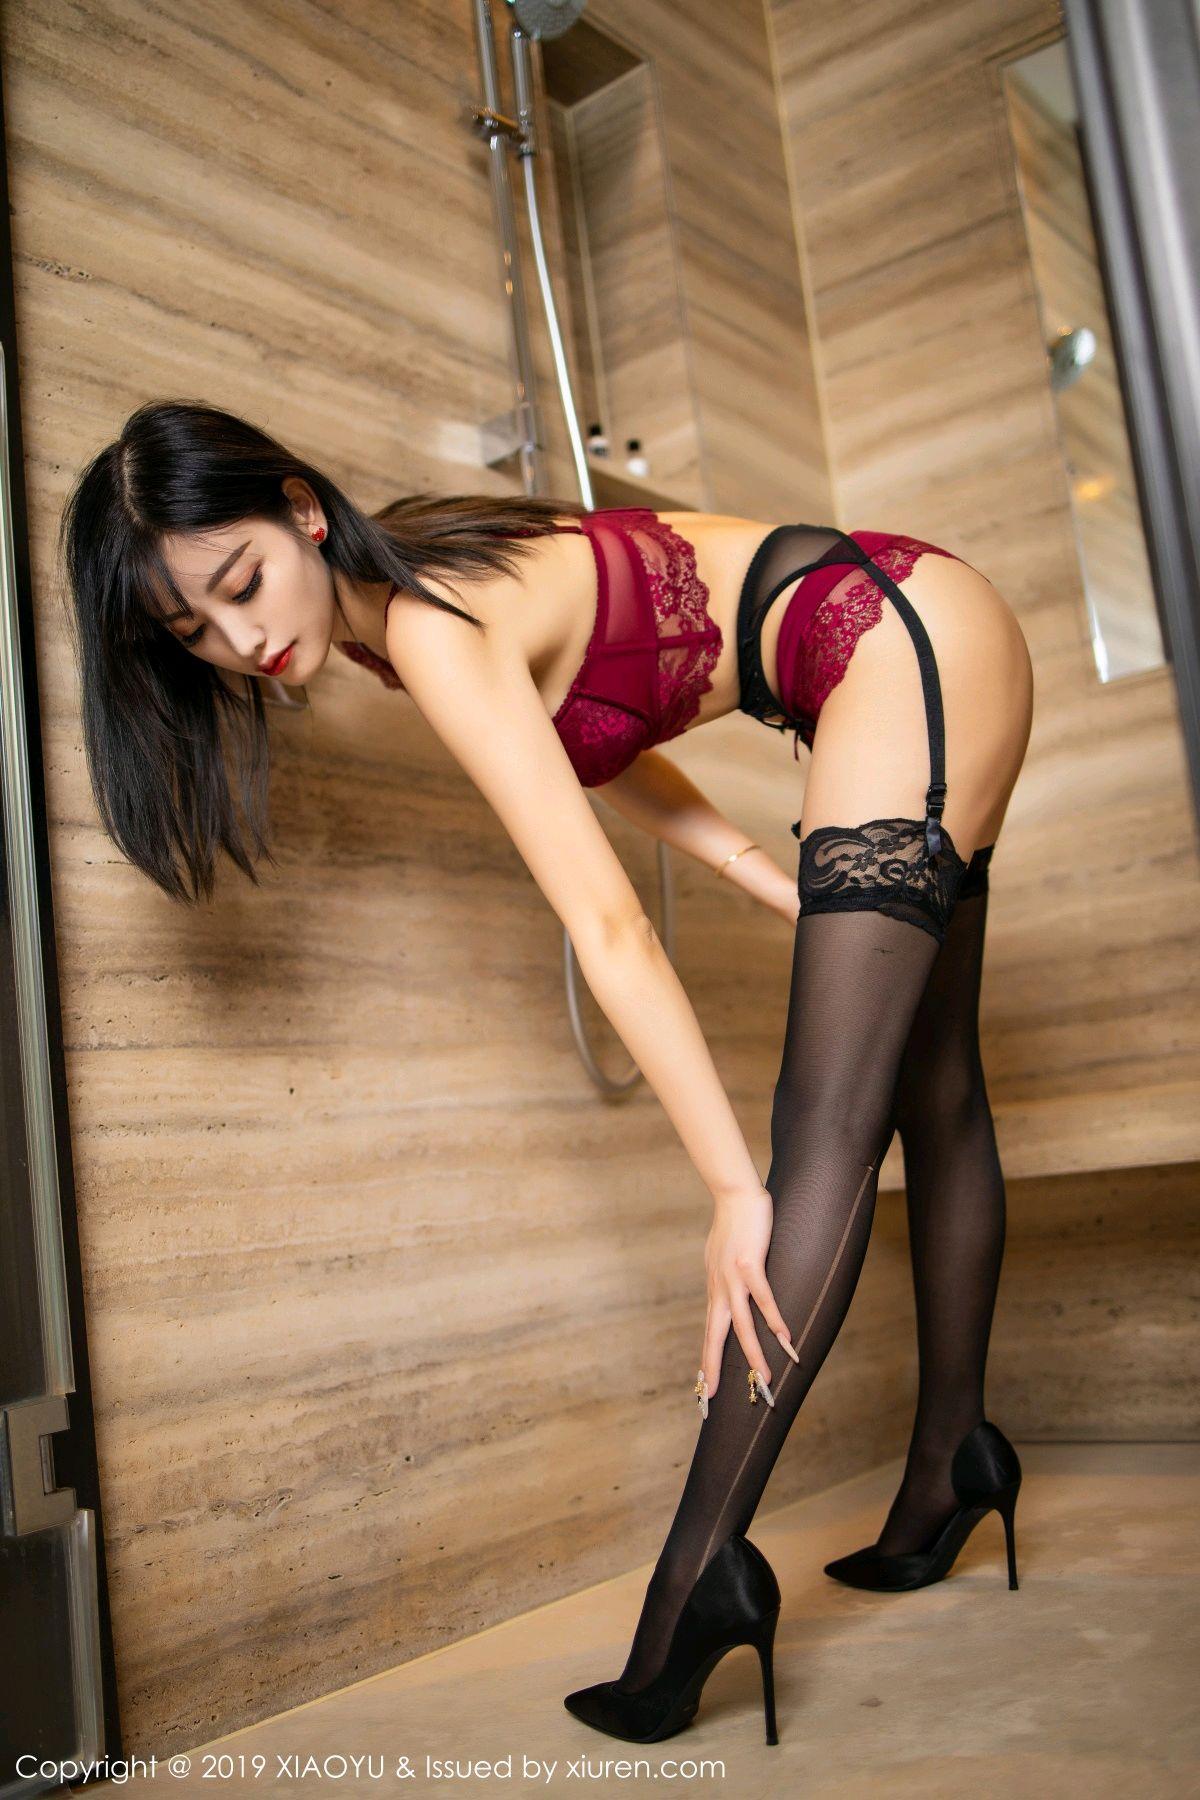 [XiaoYu] Vol.153 Yang Chen Chen 53P, Bathroom, Black Silk, Underwear, XiaoYu, Yang Chen Chen